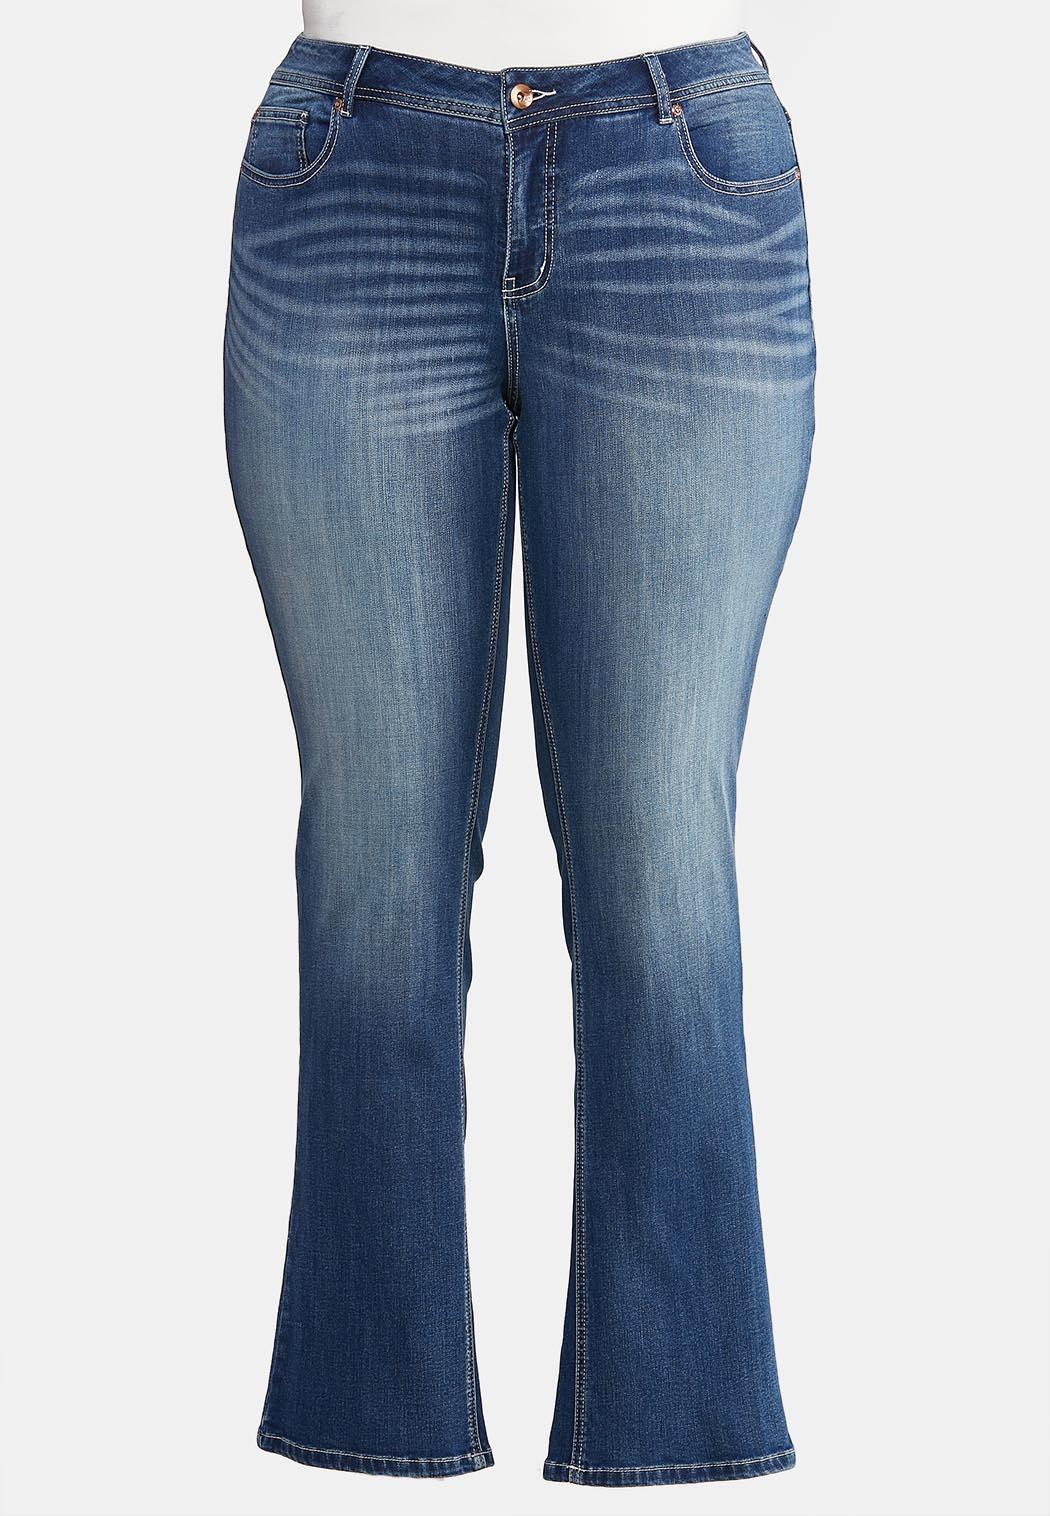 Plus Petite Dark Wash Bootcut Jeans